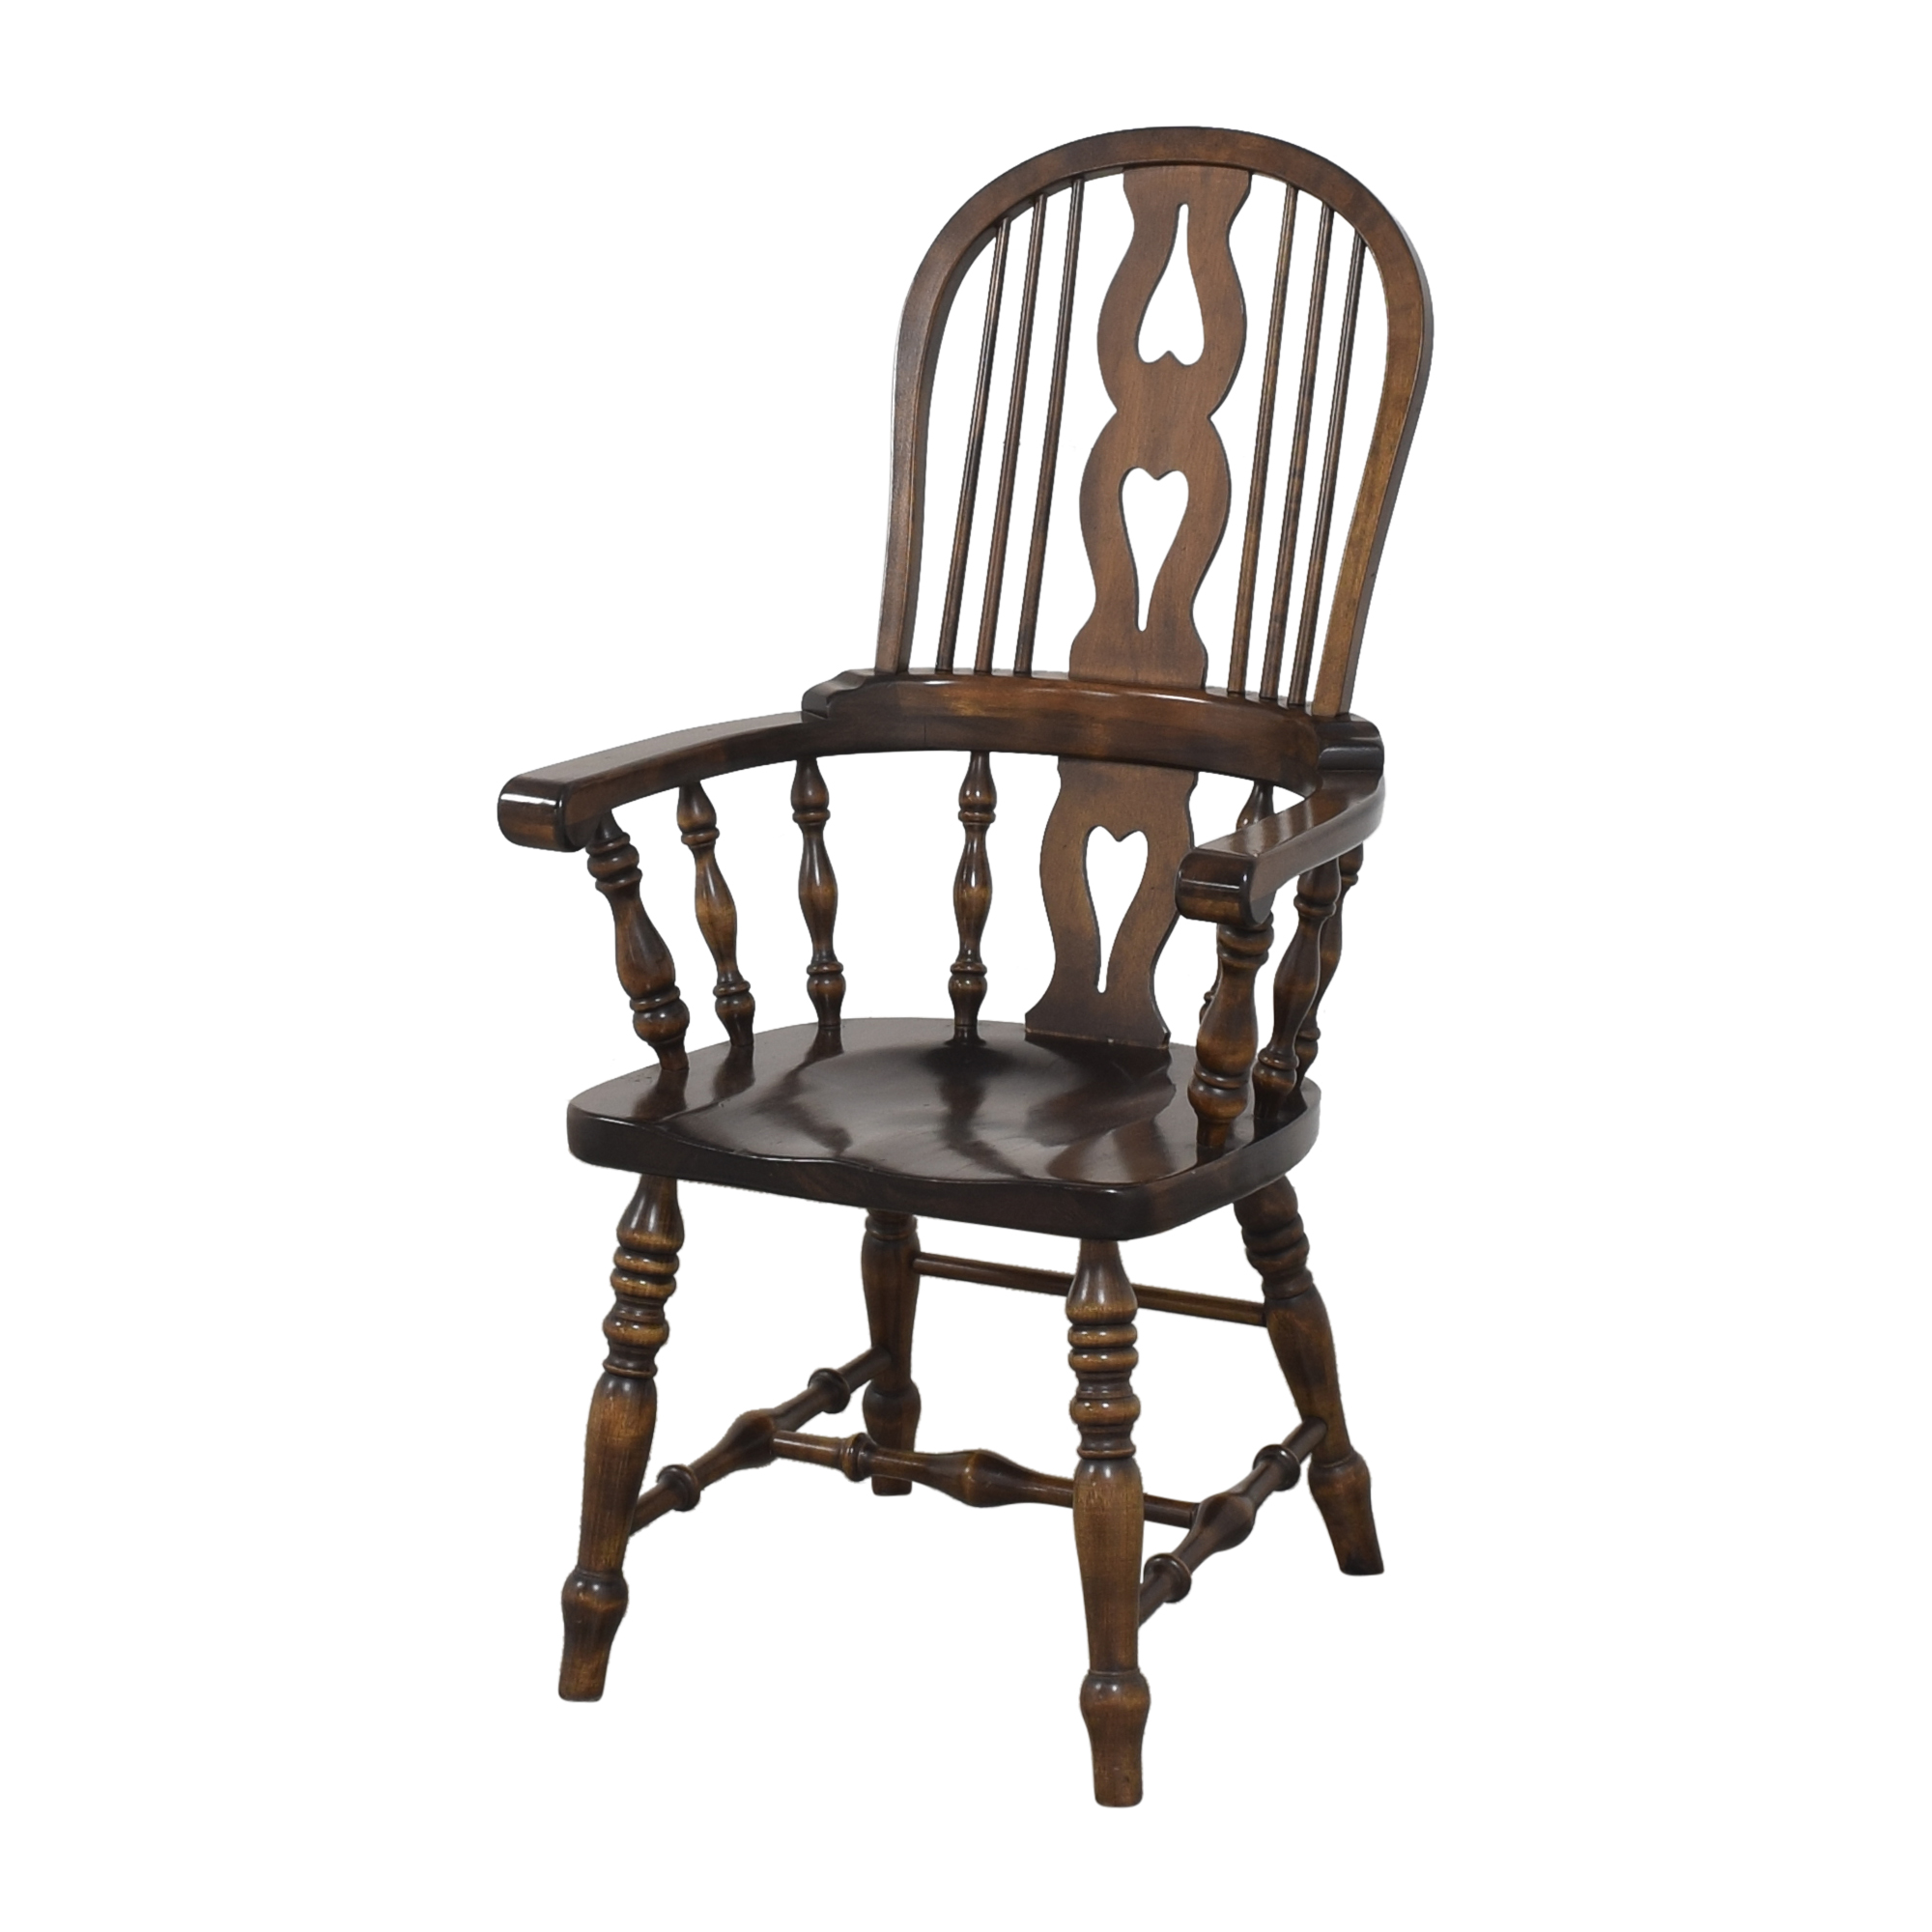 Bennington Pine Bennington Pine Vintage Windsor-Style Arm Chairs